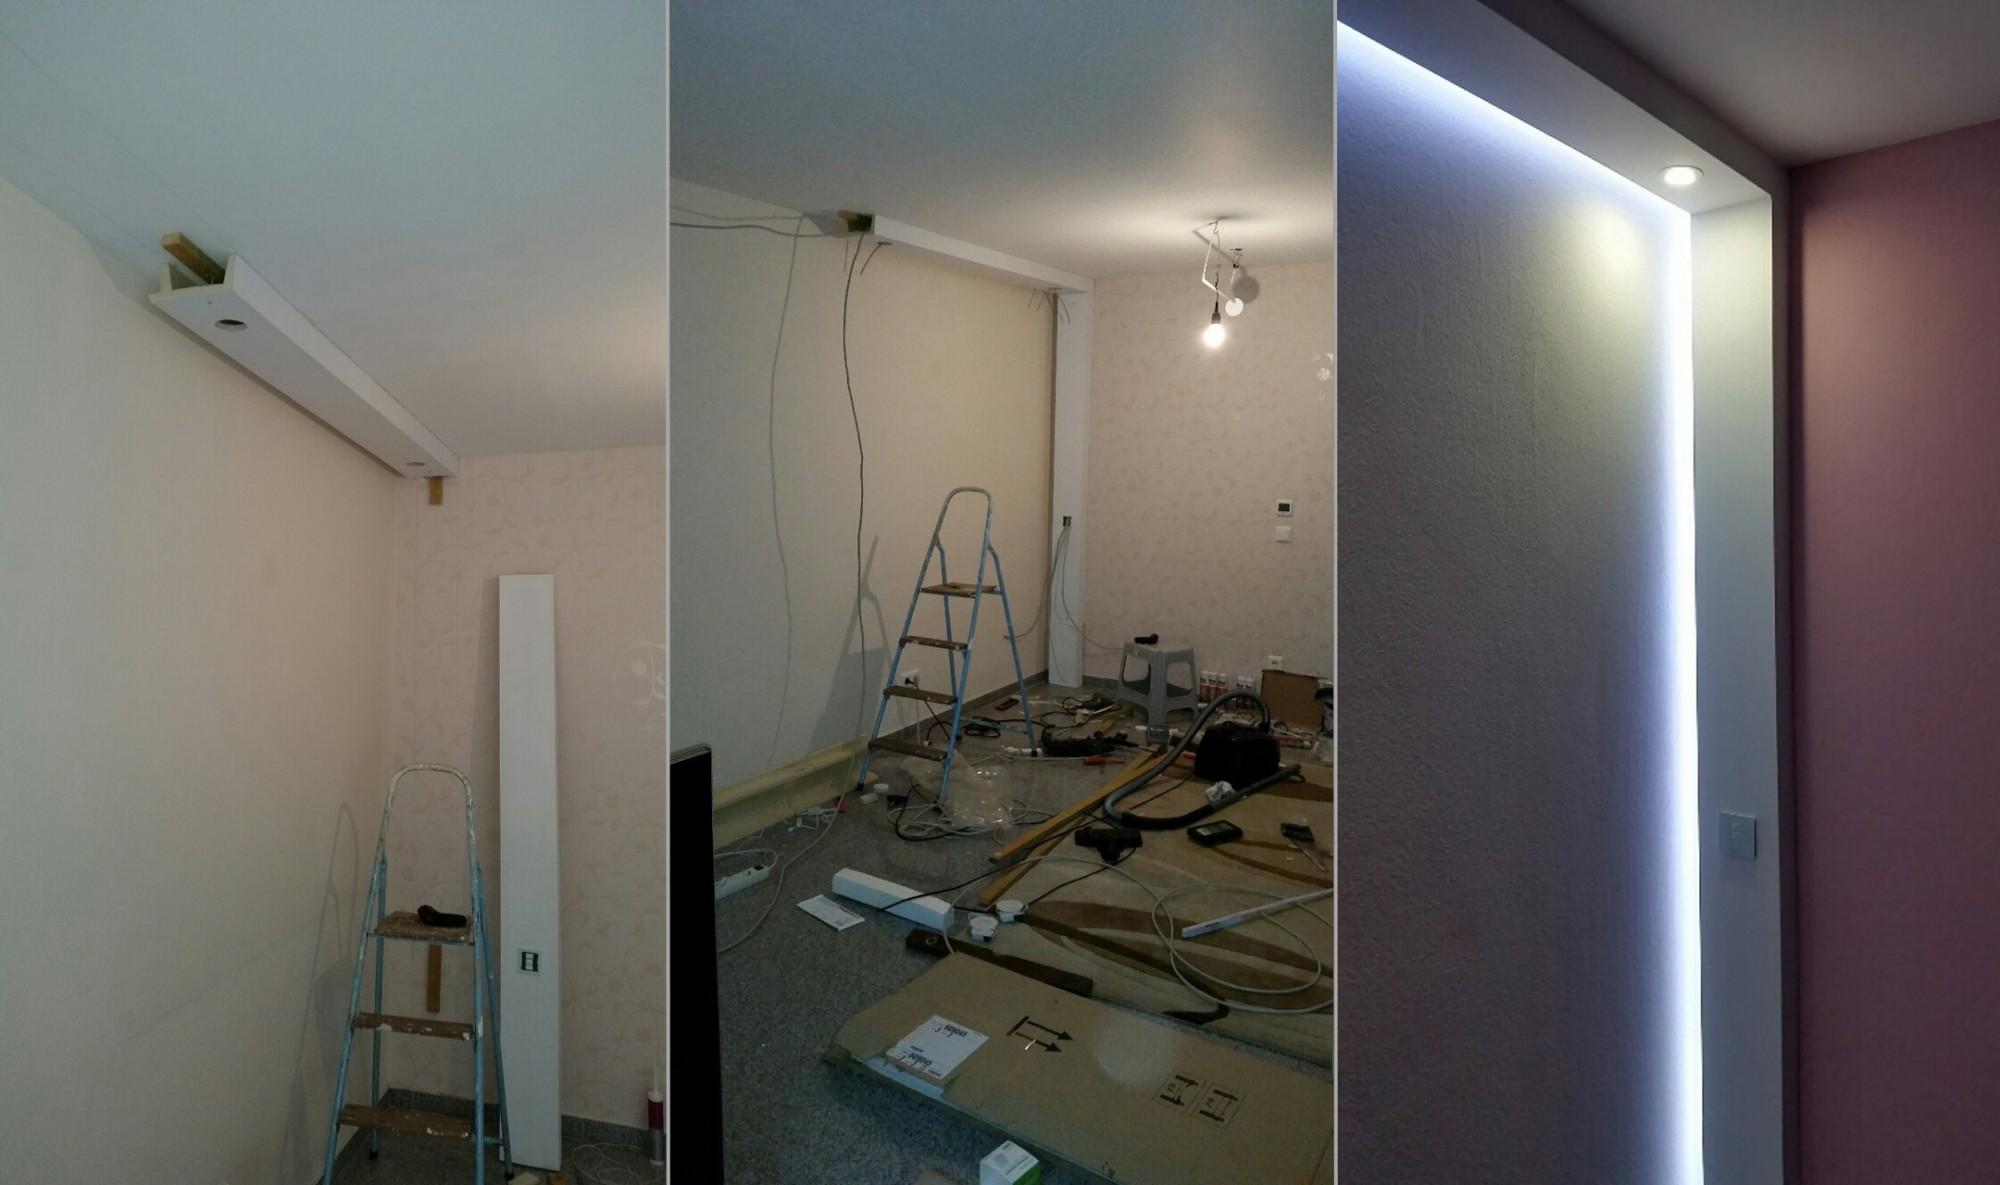 2 meter pu spots kasten led leuchten stuck deckenprofil. Black Bedroom Furniture Sets. Home Design Ideas